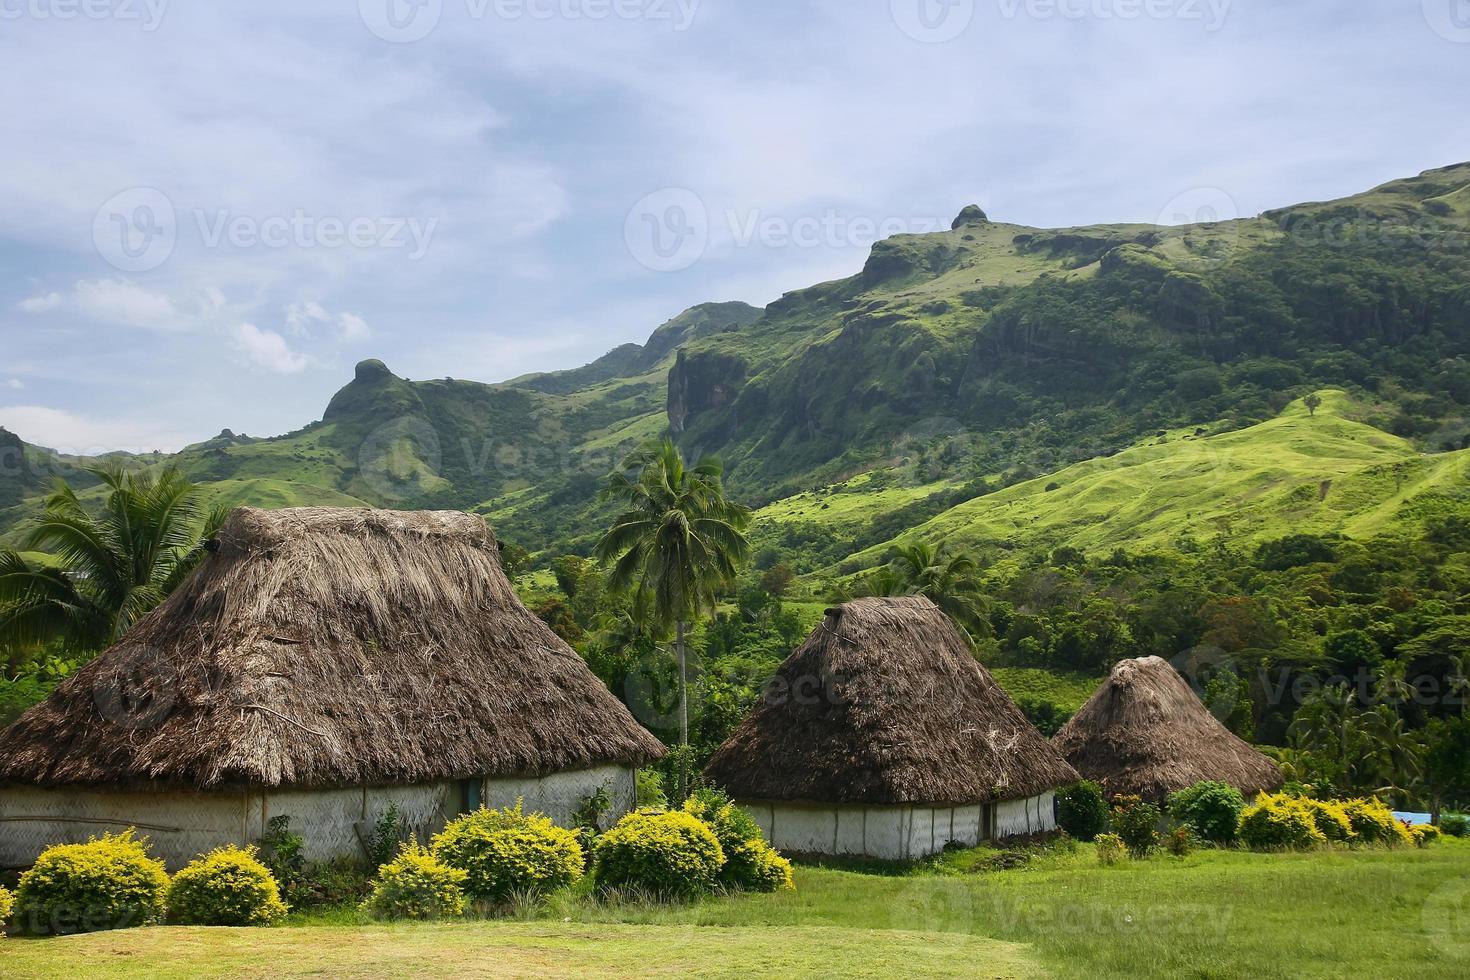 traditionelle Häuser des Navala-Dorfes, Viti Levu, Fidschi foto